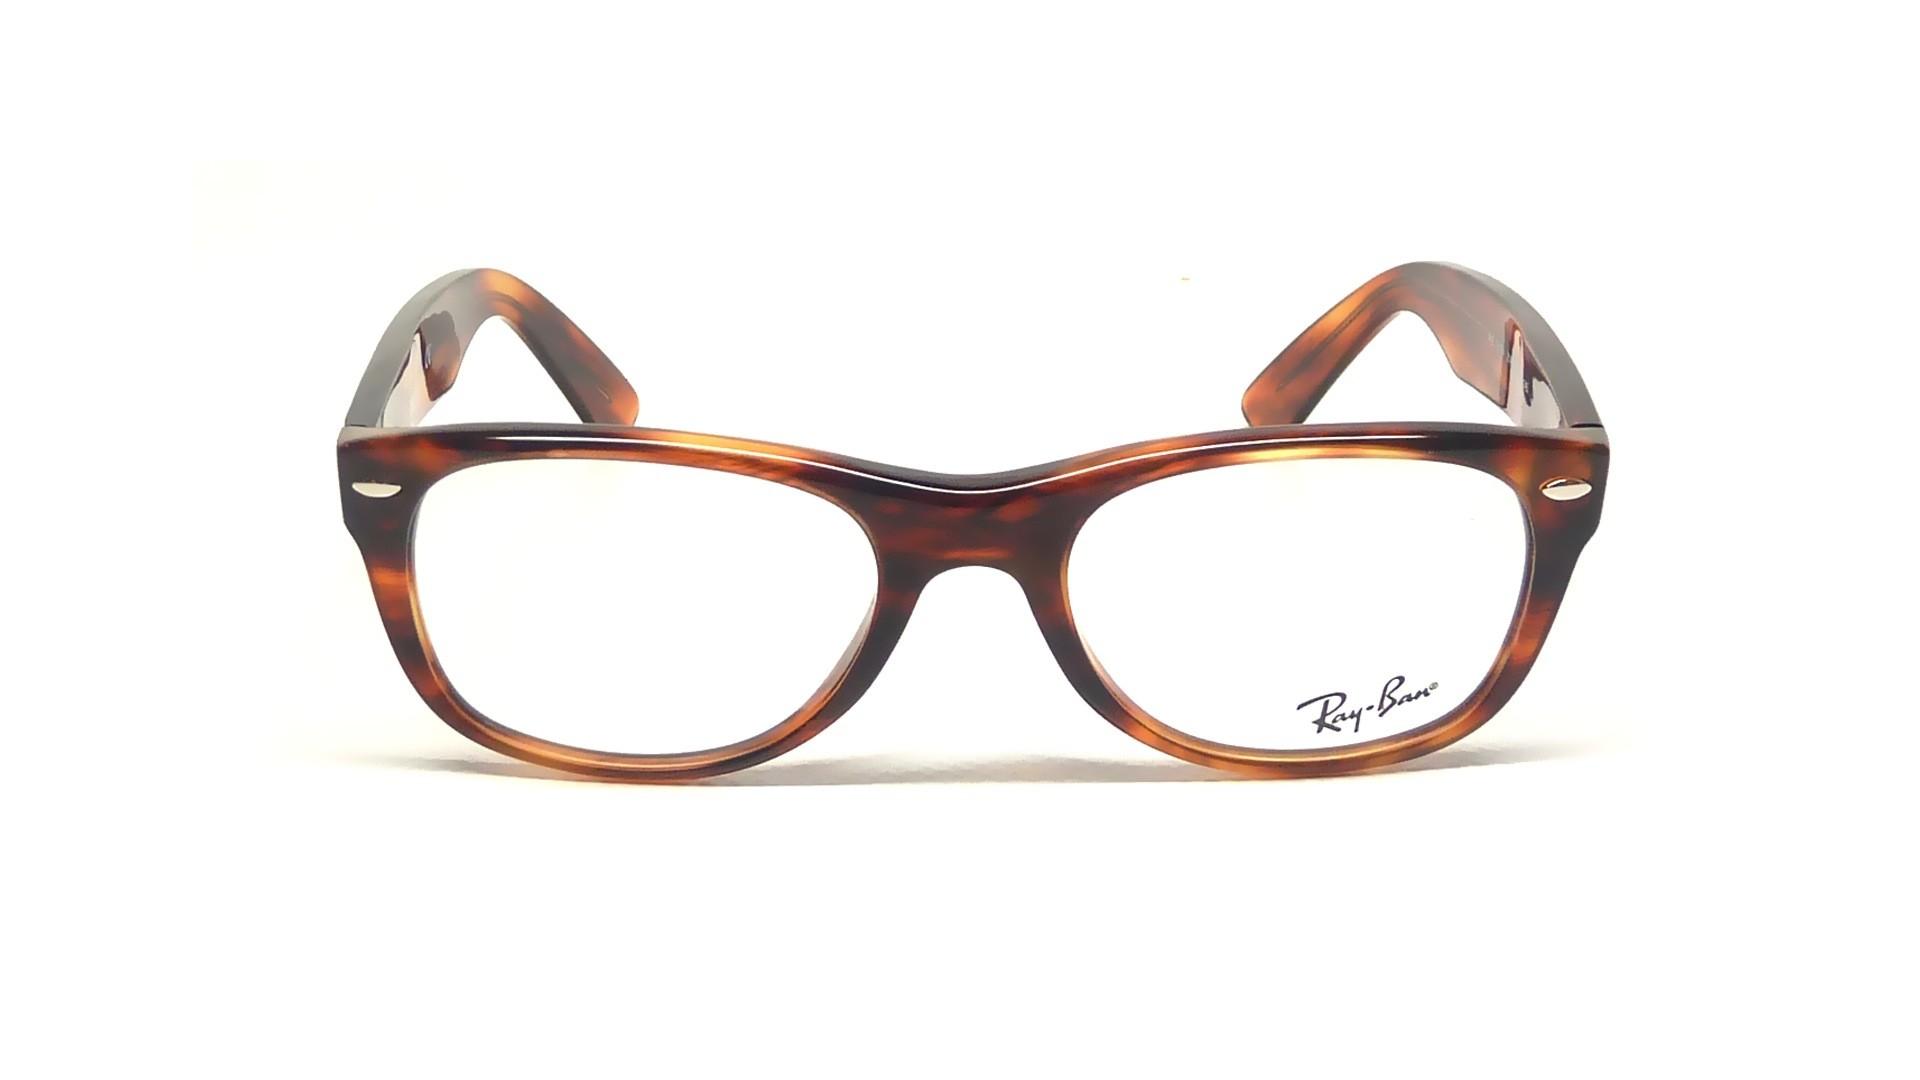 7af93fa9c56 Ray Ban 5184 Eyeglasses 2144 « Heritage Malta